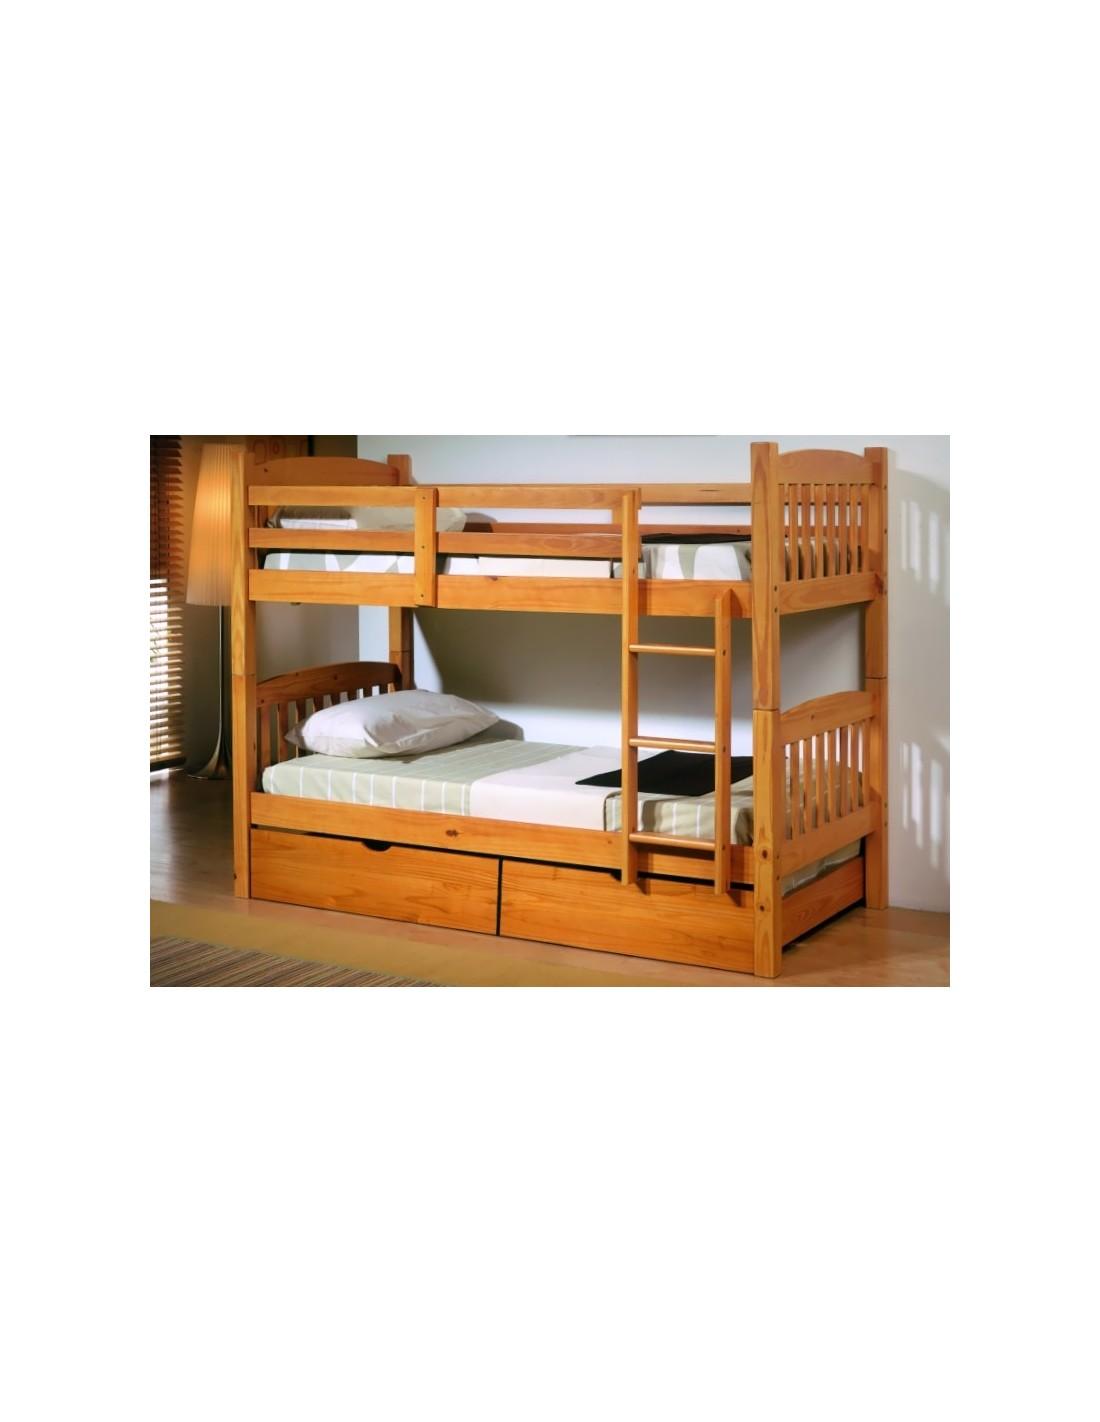 Litera de madera en madrid muebles noel - Literas de madera maciza ...